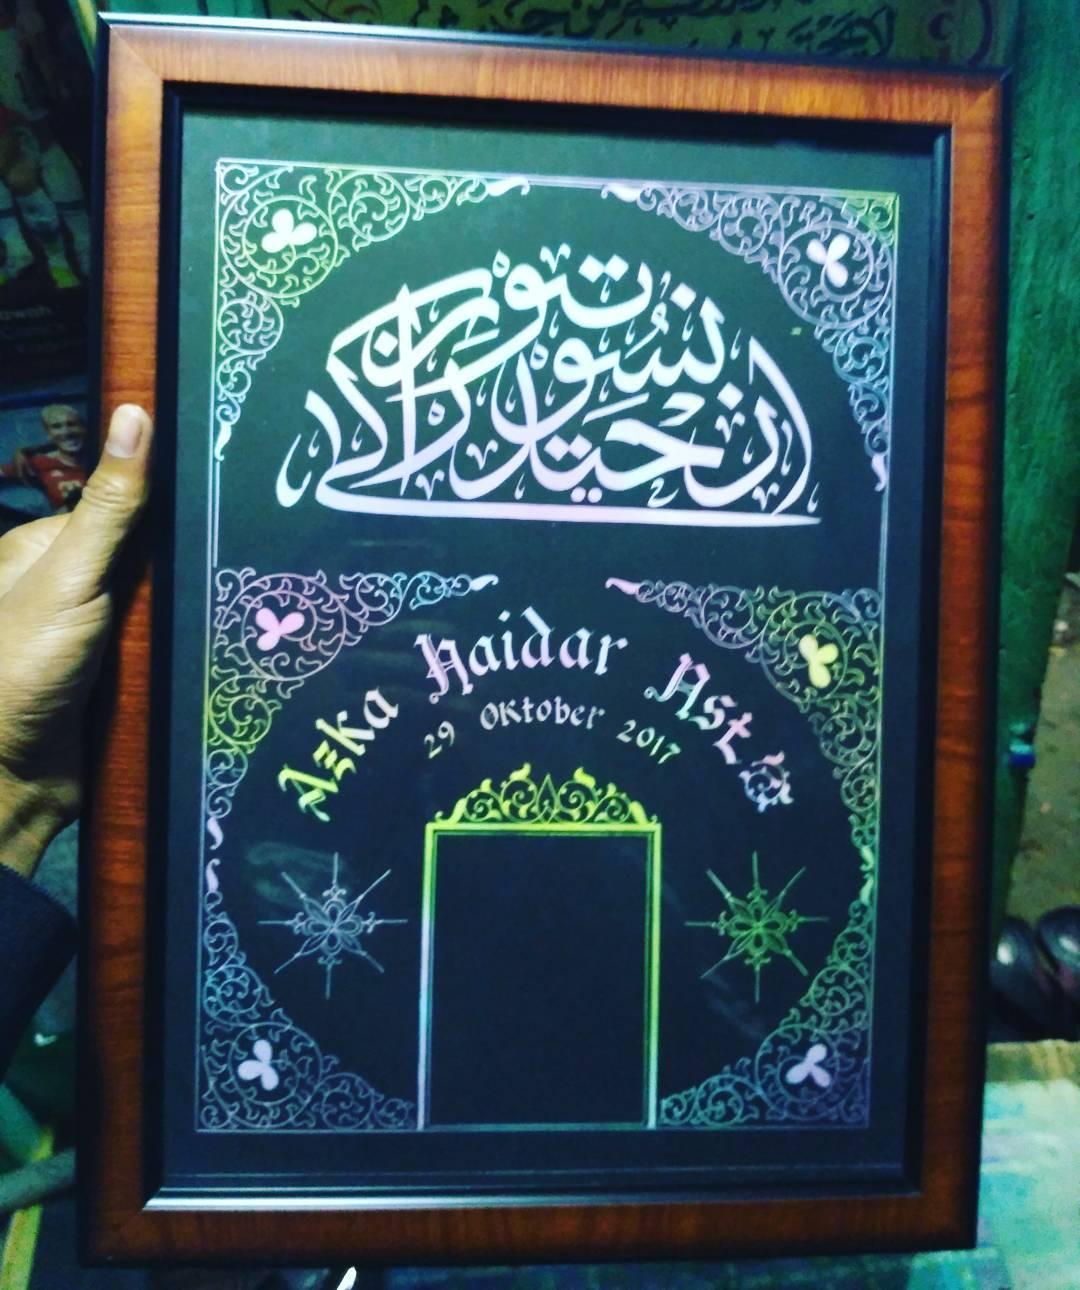 Works Calligraphy Taufik Hasibuan Kaligrafi nama…. By kertas pelangi  Minat chat me… … 58